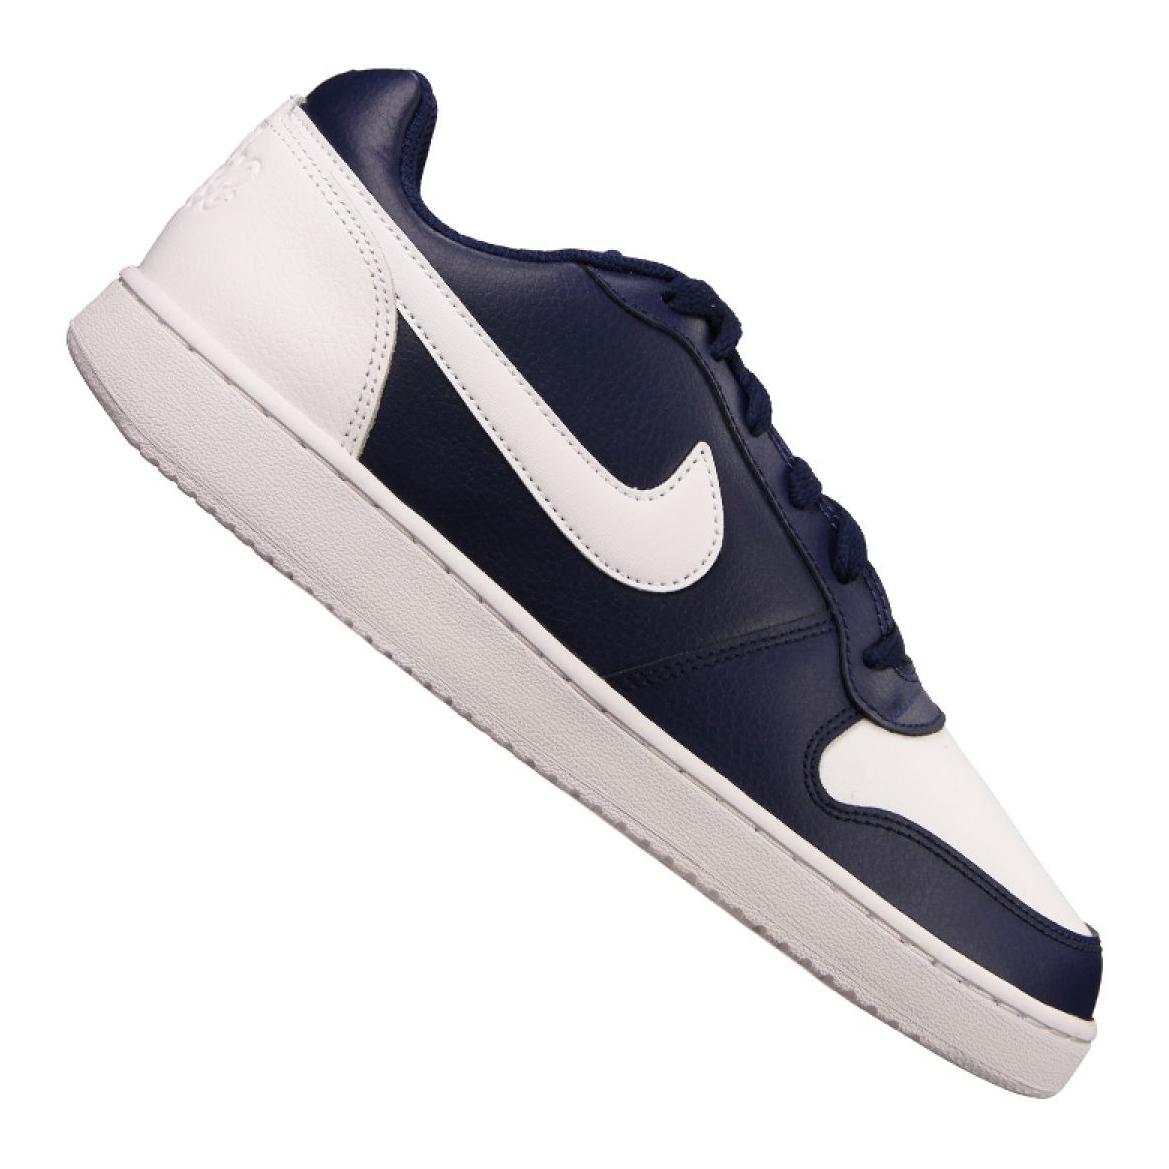 Nike Herren Ebernon Low Aq1775 002 Sneaker: